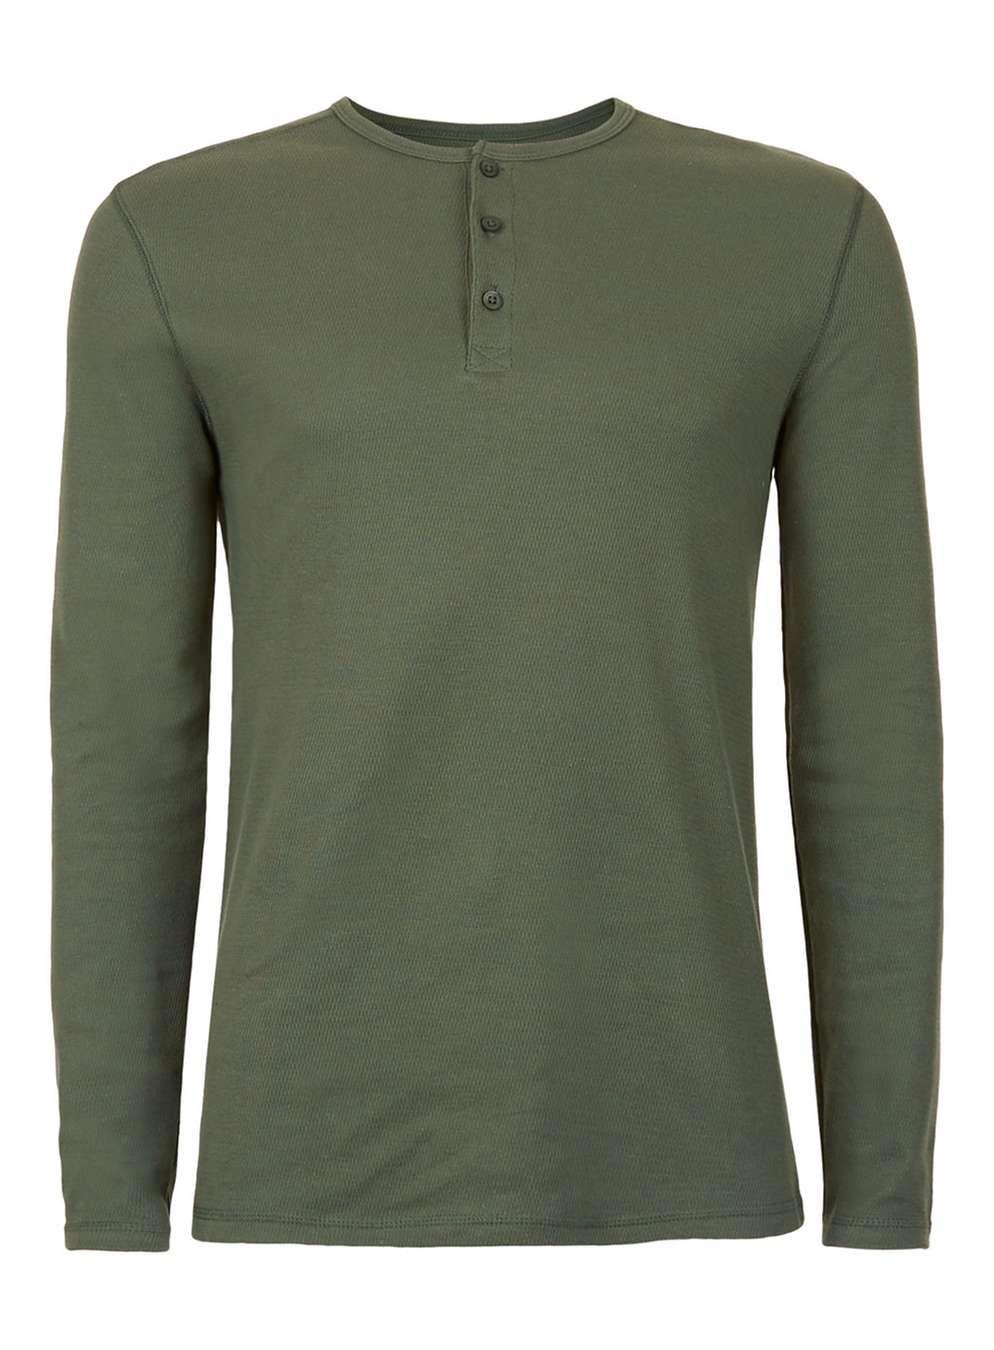 Khaki Textured Grandad Collar Long Sleeve T-Shirt - T-shirts & Tanks - Clothing - TOPMAN USA